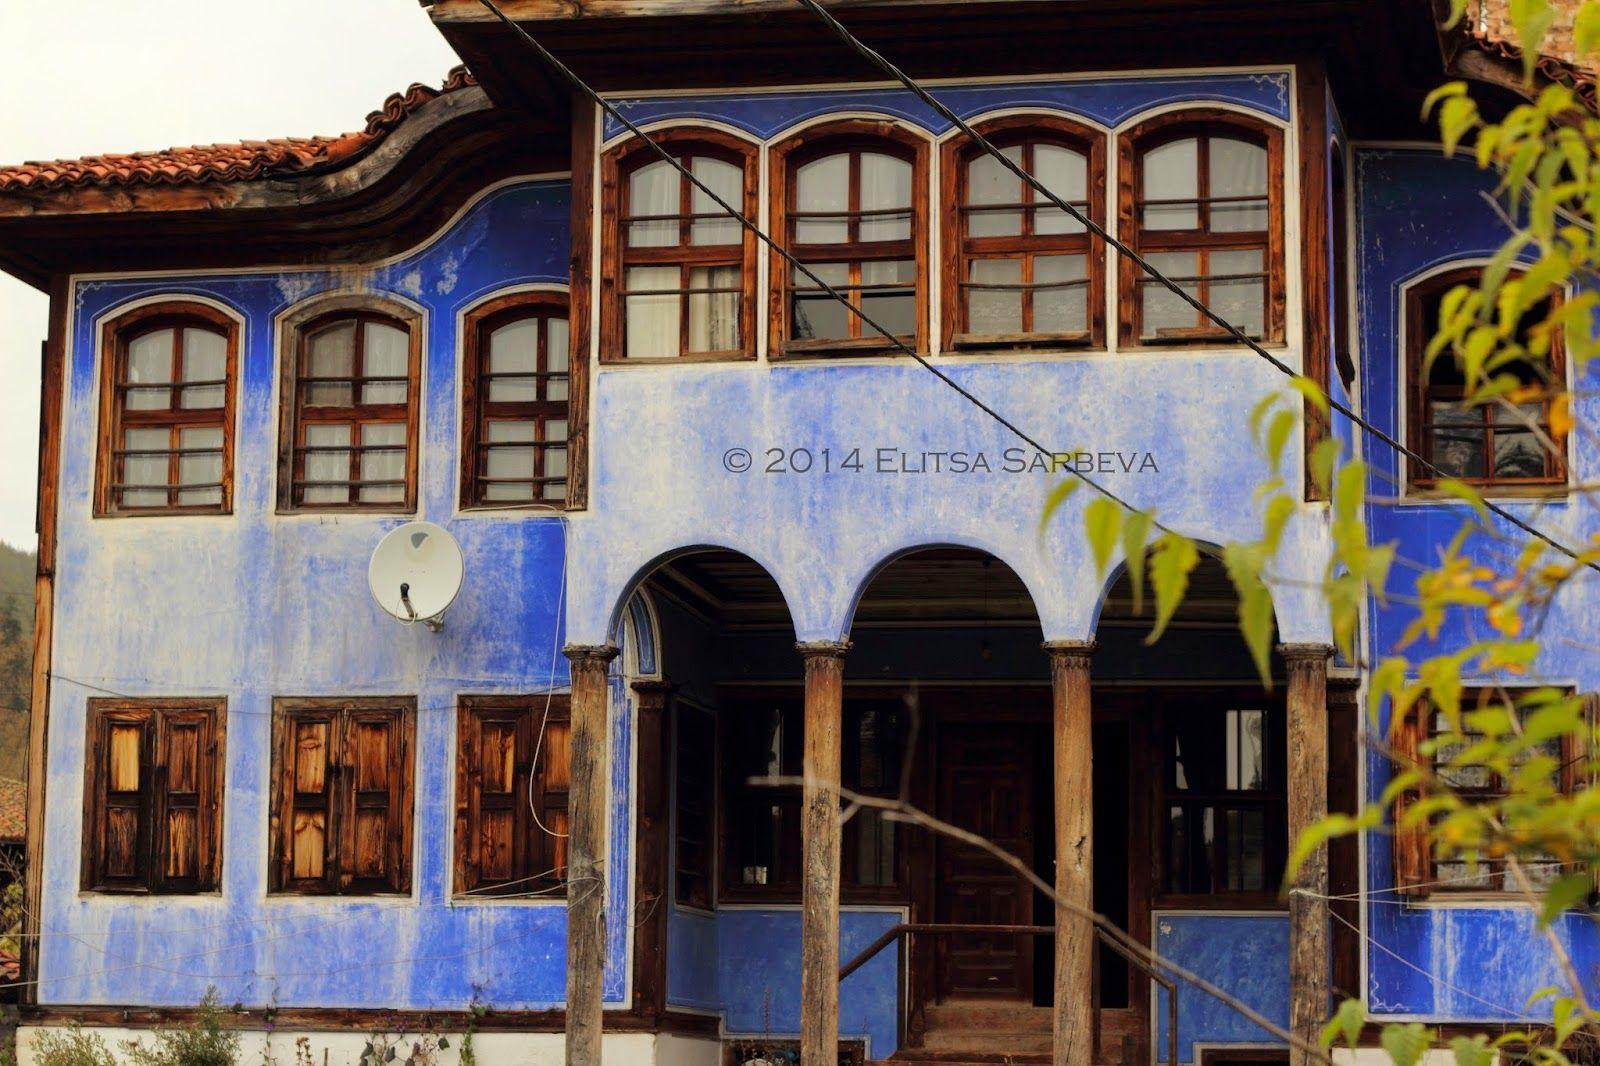 http://cakeandpancake.blogspot.com/2014/10/the-historic-town-koprivshtitsa.html